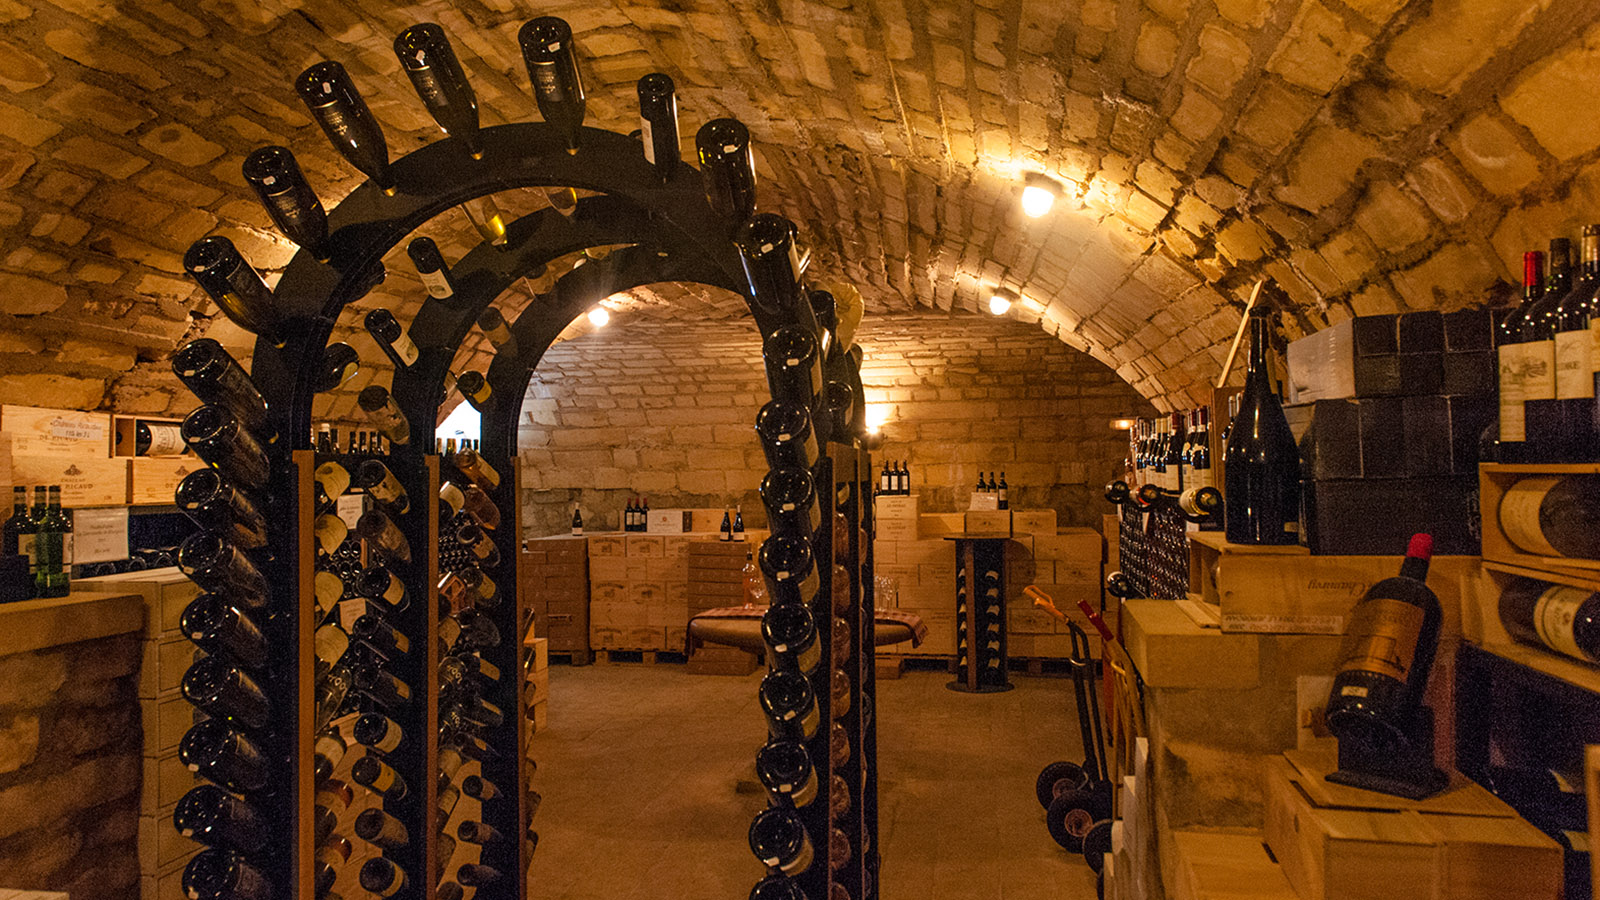 Der Weinkeller der Ferme-Auberge de la Klauss. Foto: Hilke Maunder